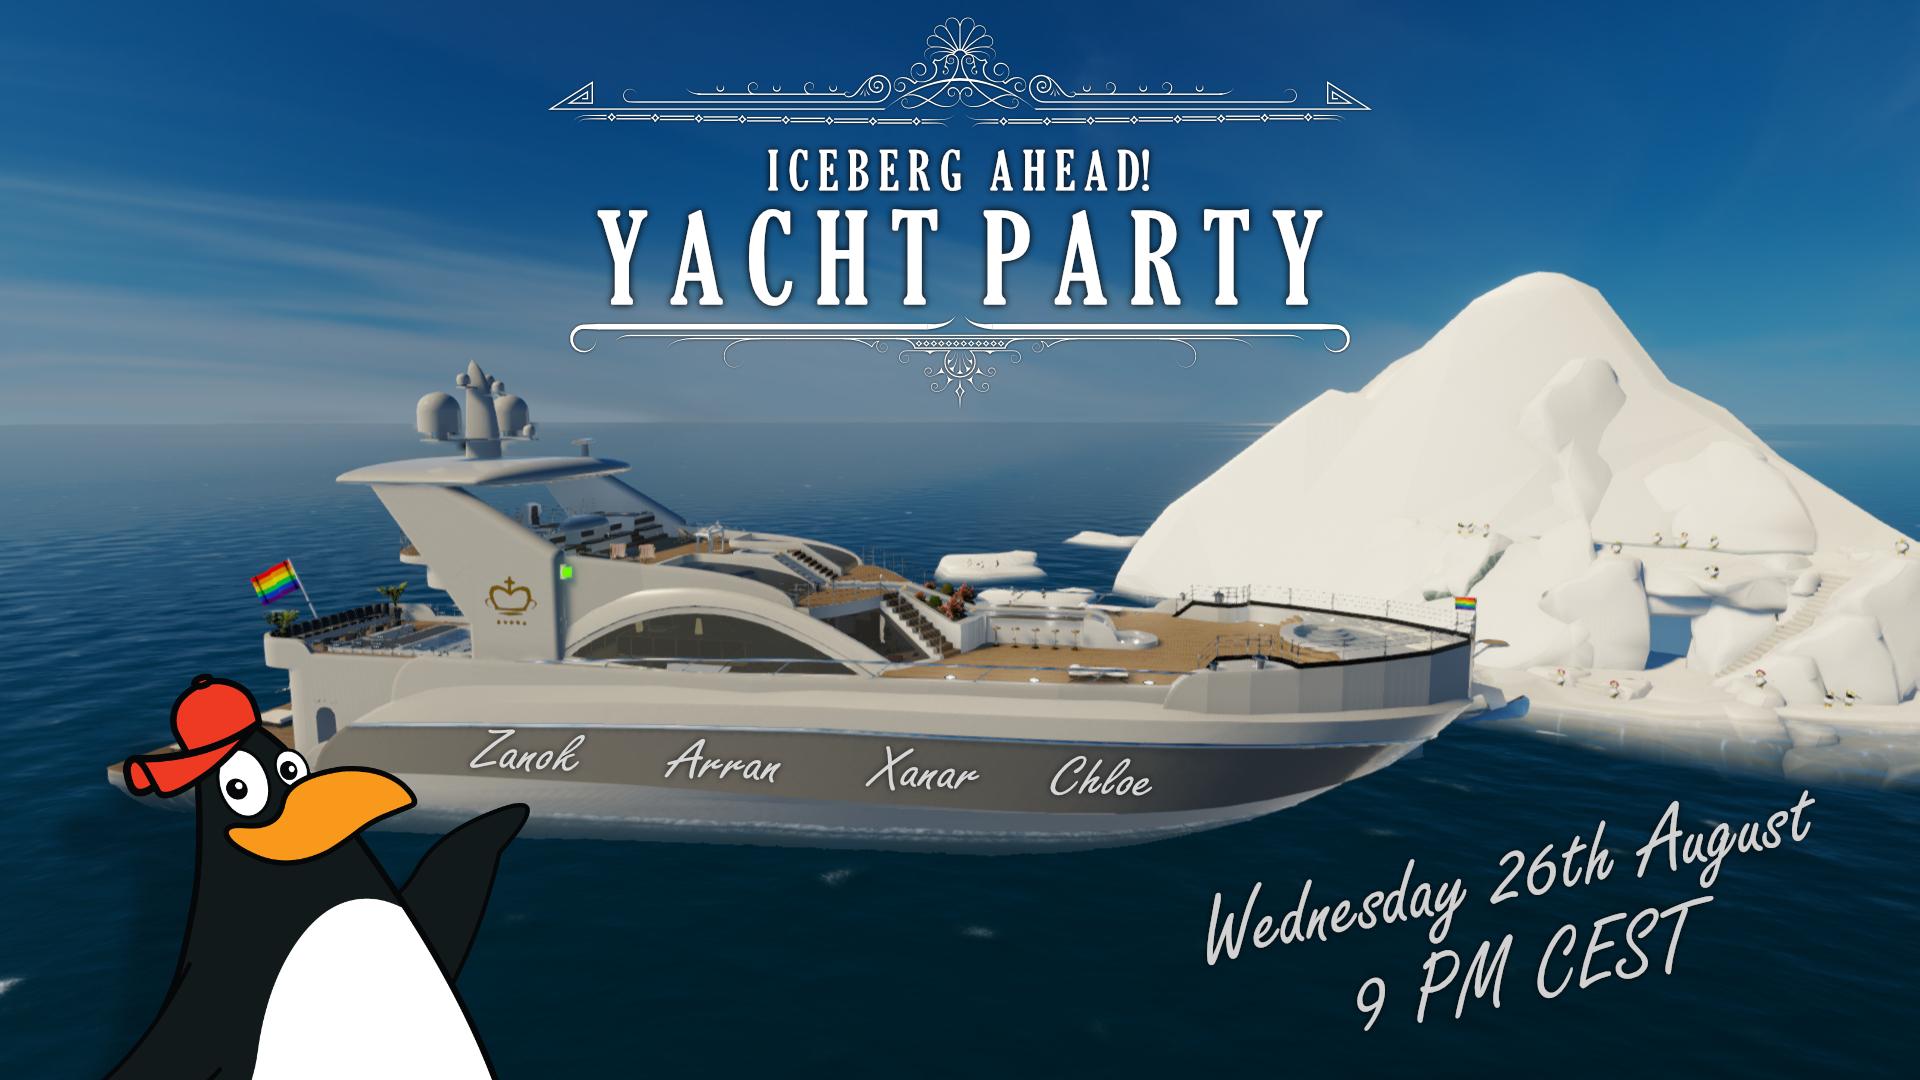 yacht-party_iceberg5tjot.jpg